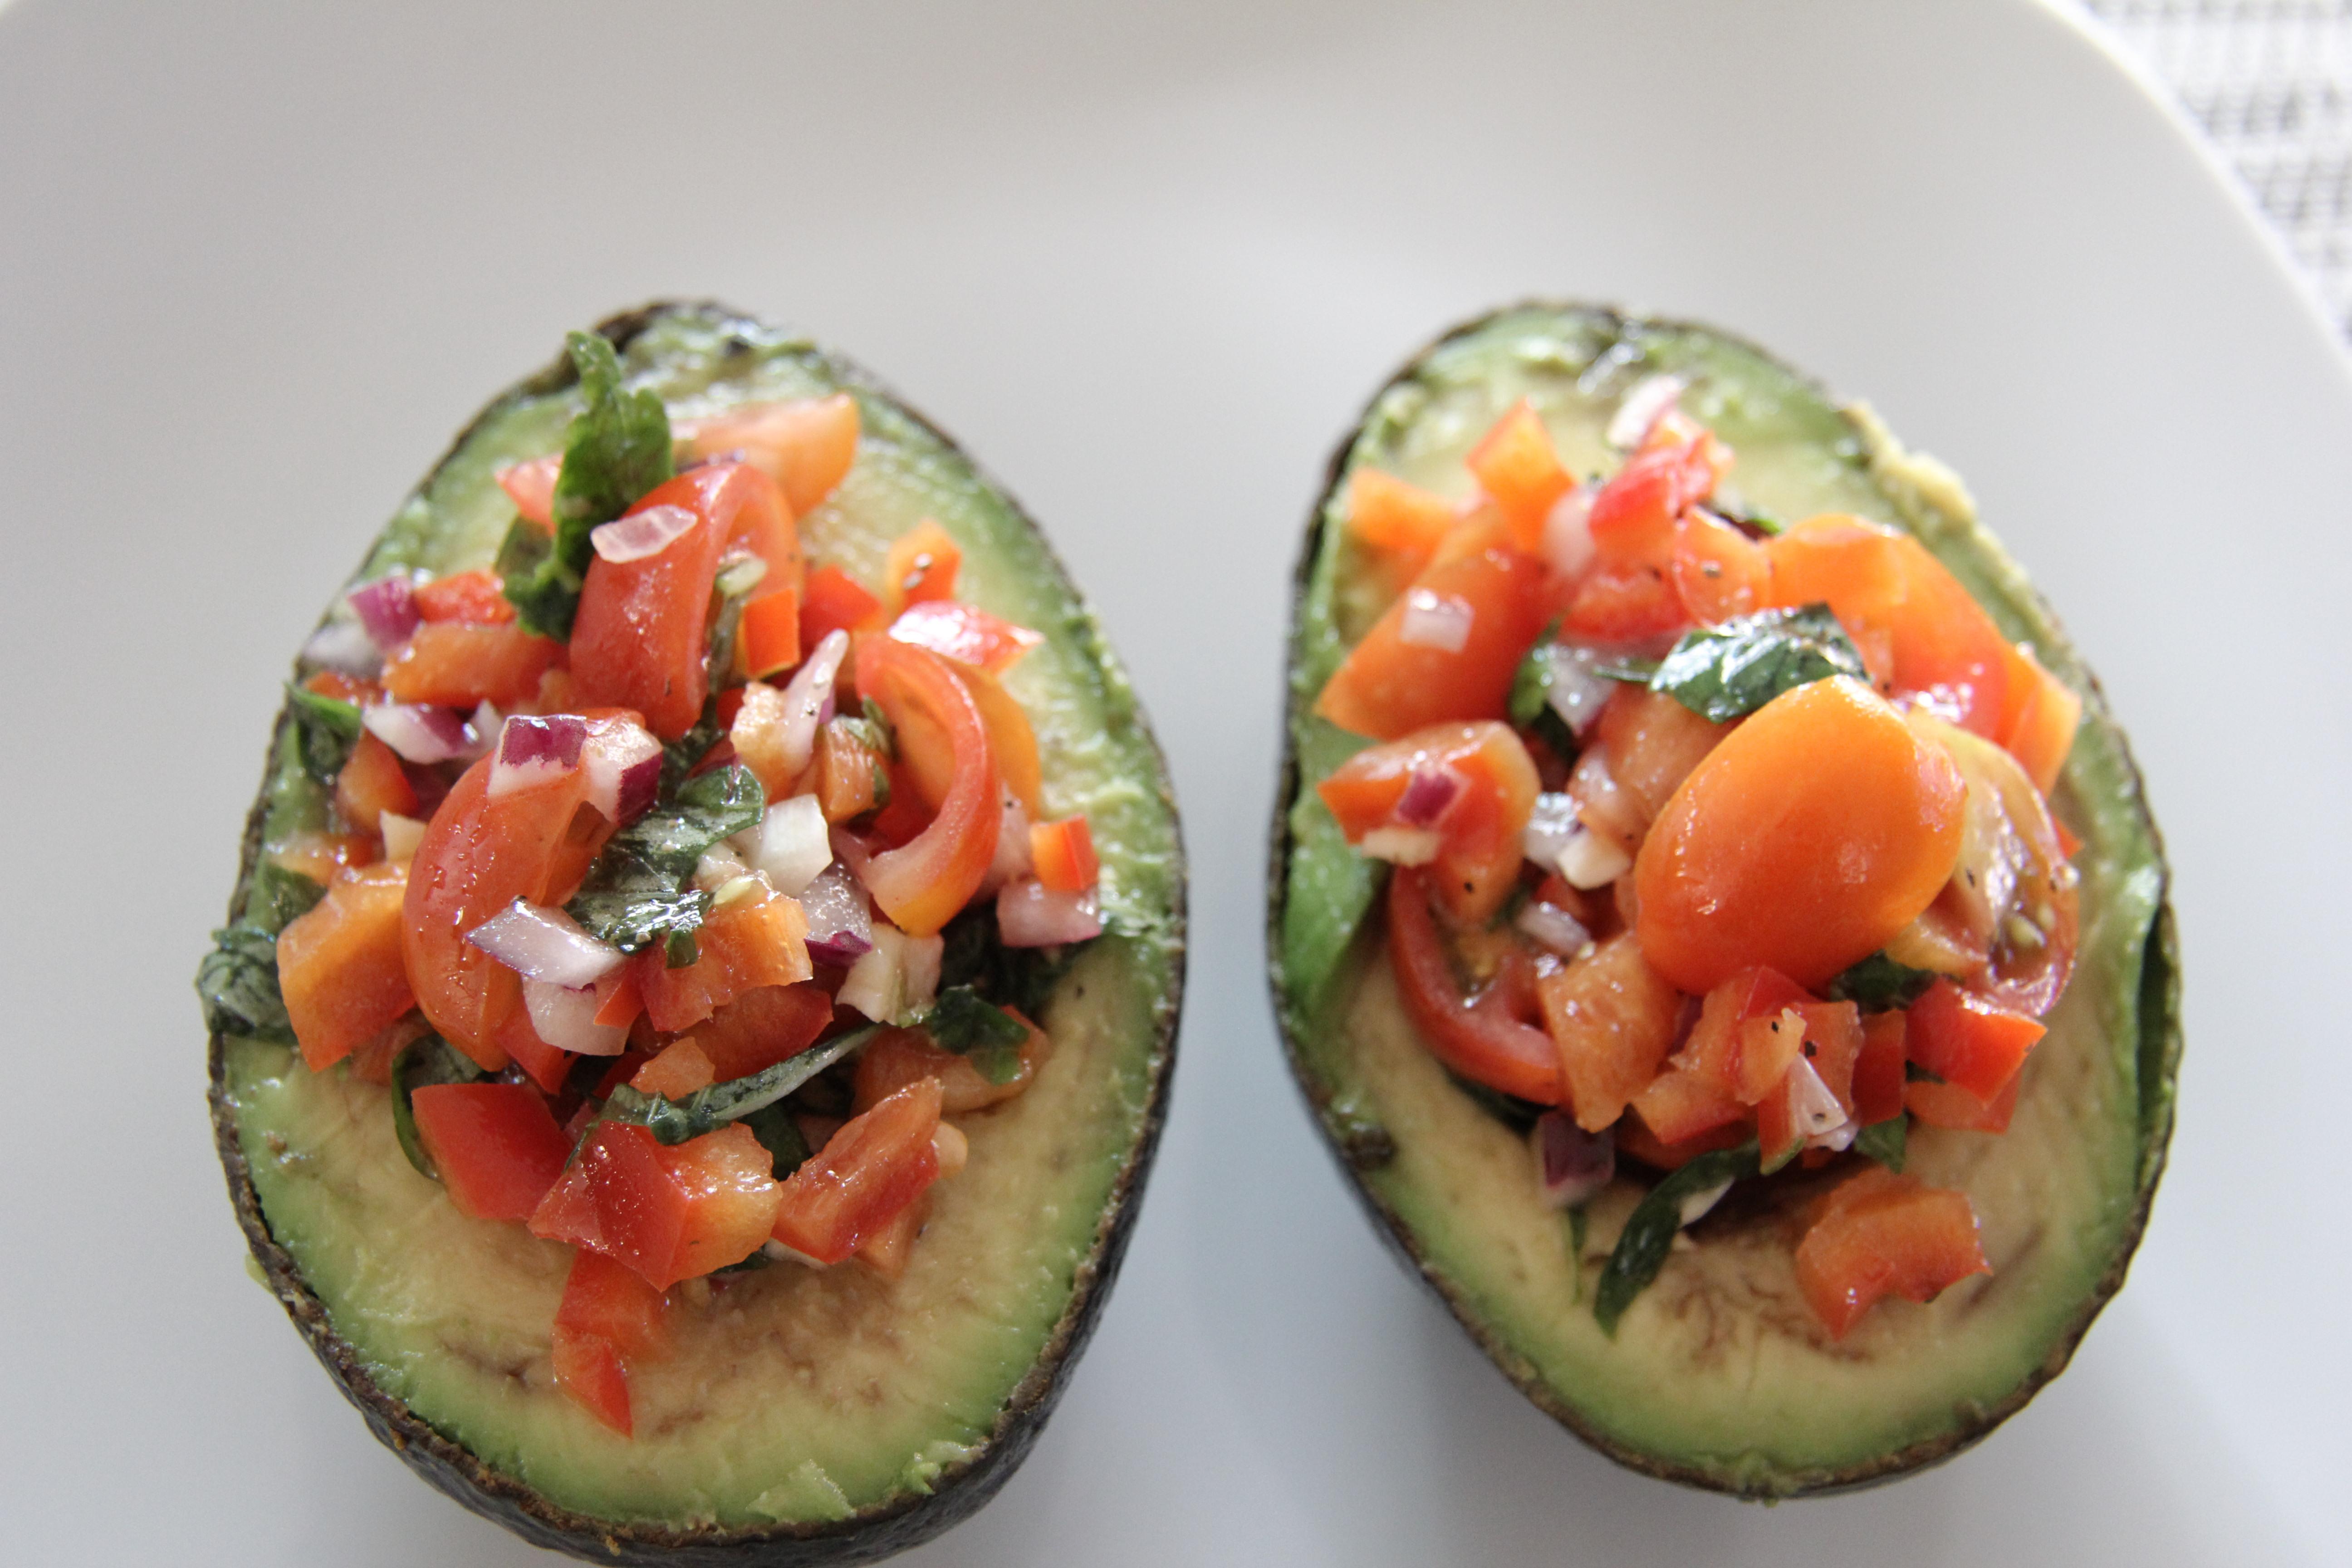 stuffed avocado